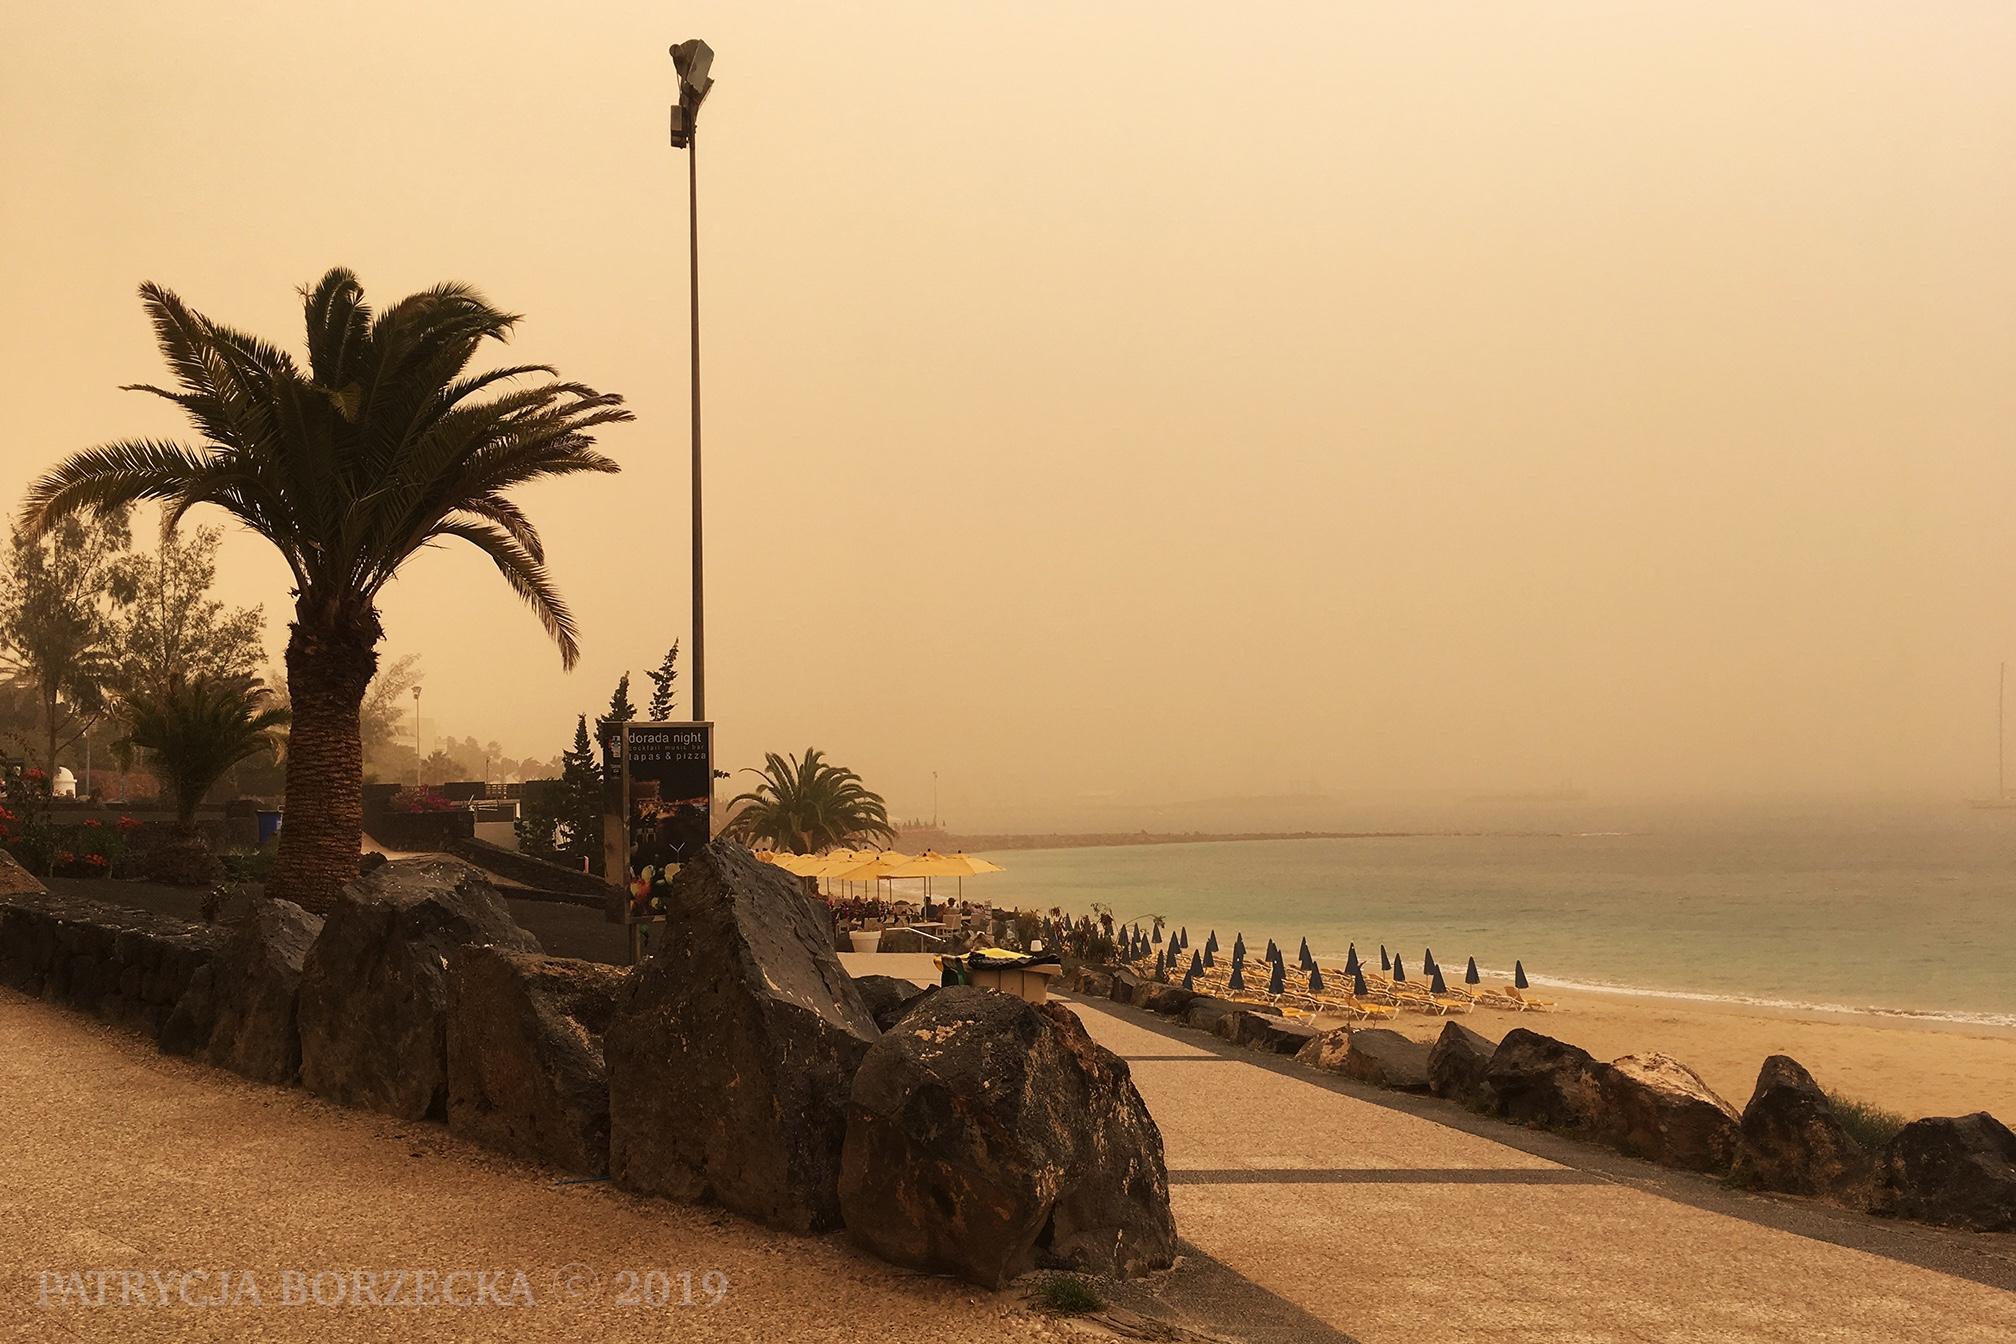 Lanzarote-Calima-Patrycja-Borzecka-Photo